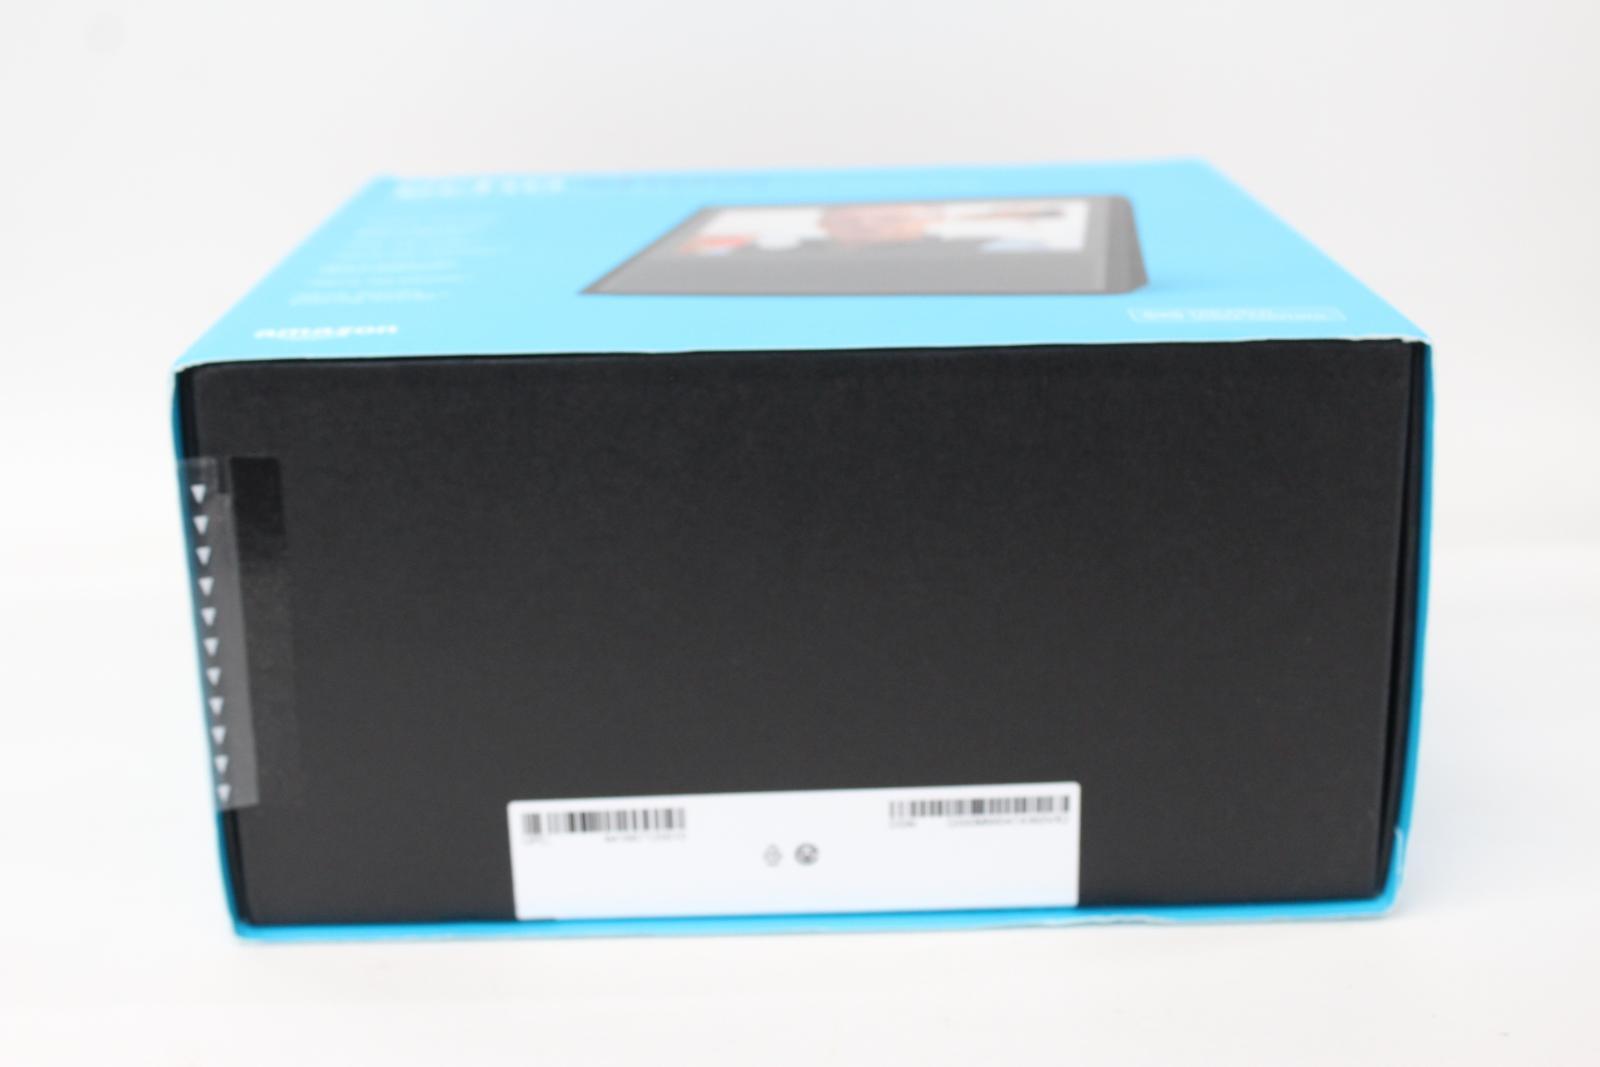 AMAZON-Echo-Show-Alexa-Smart-Assistant-Black-1st-Generation-7-034-Display-NEW thumbnail 11